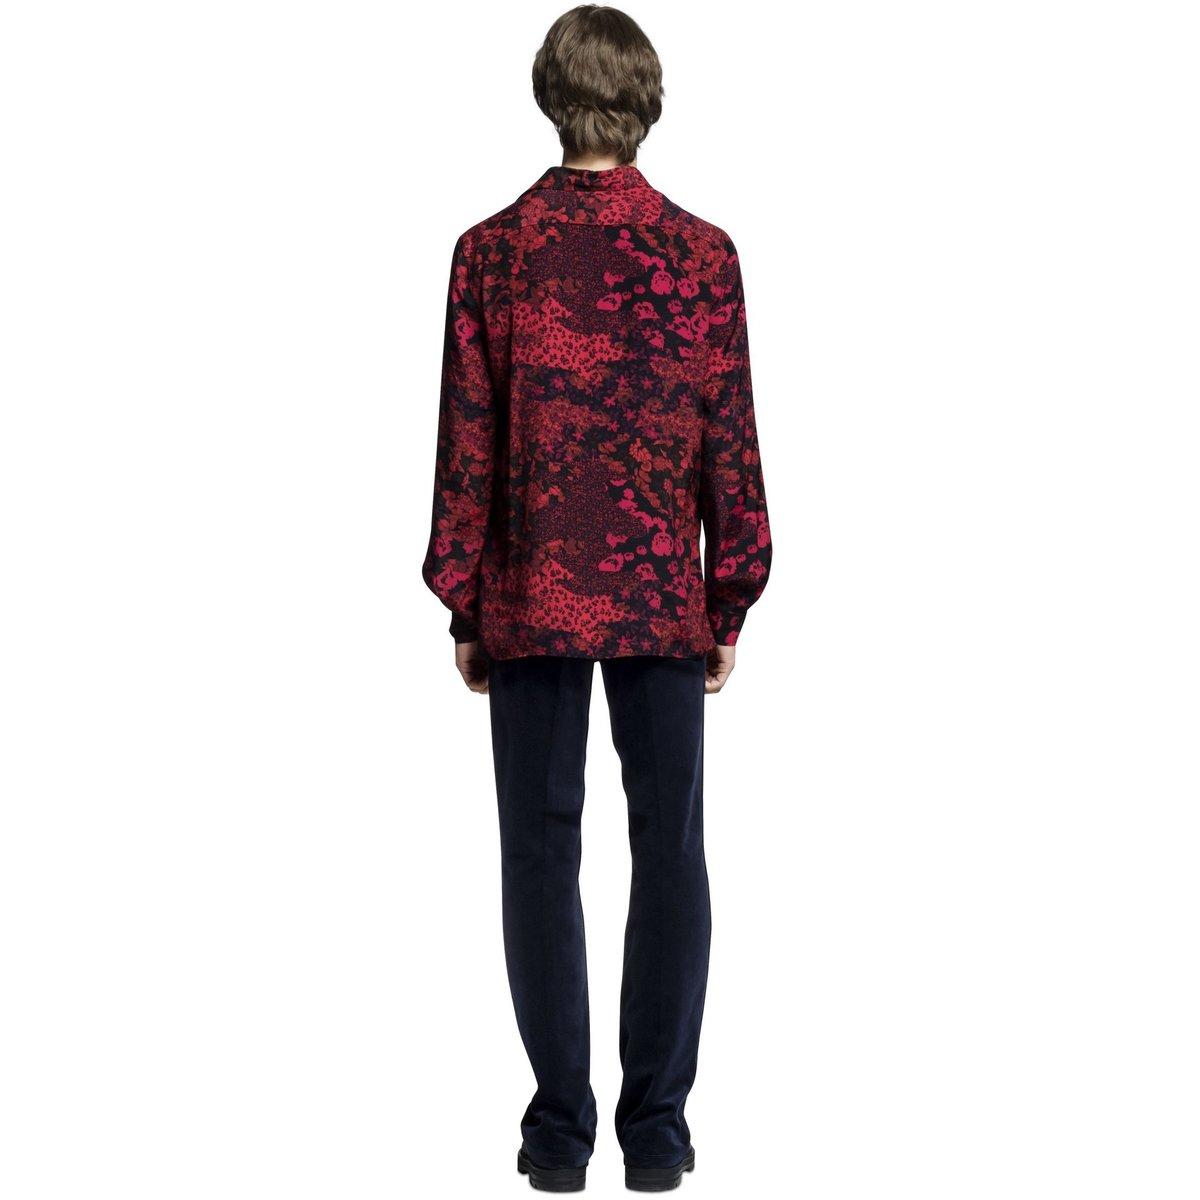 Missoni Red Floral Shirt Viscose 2.jpg